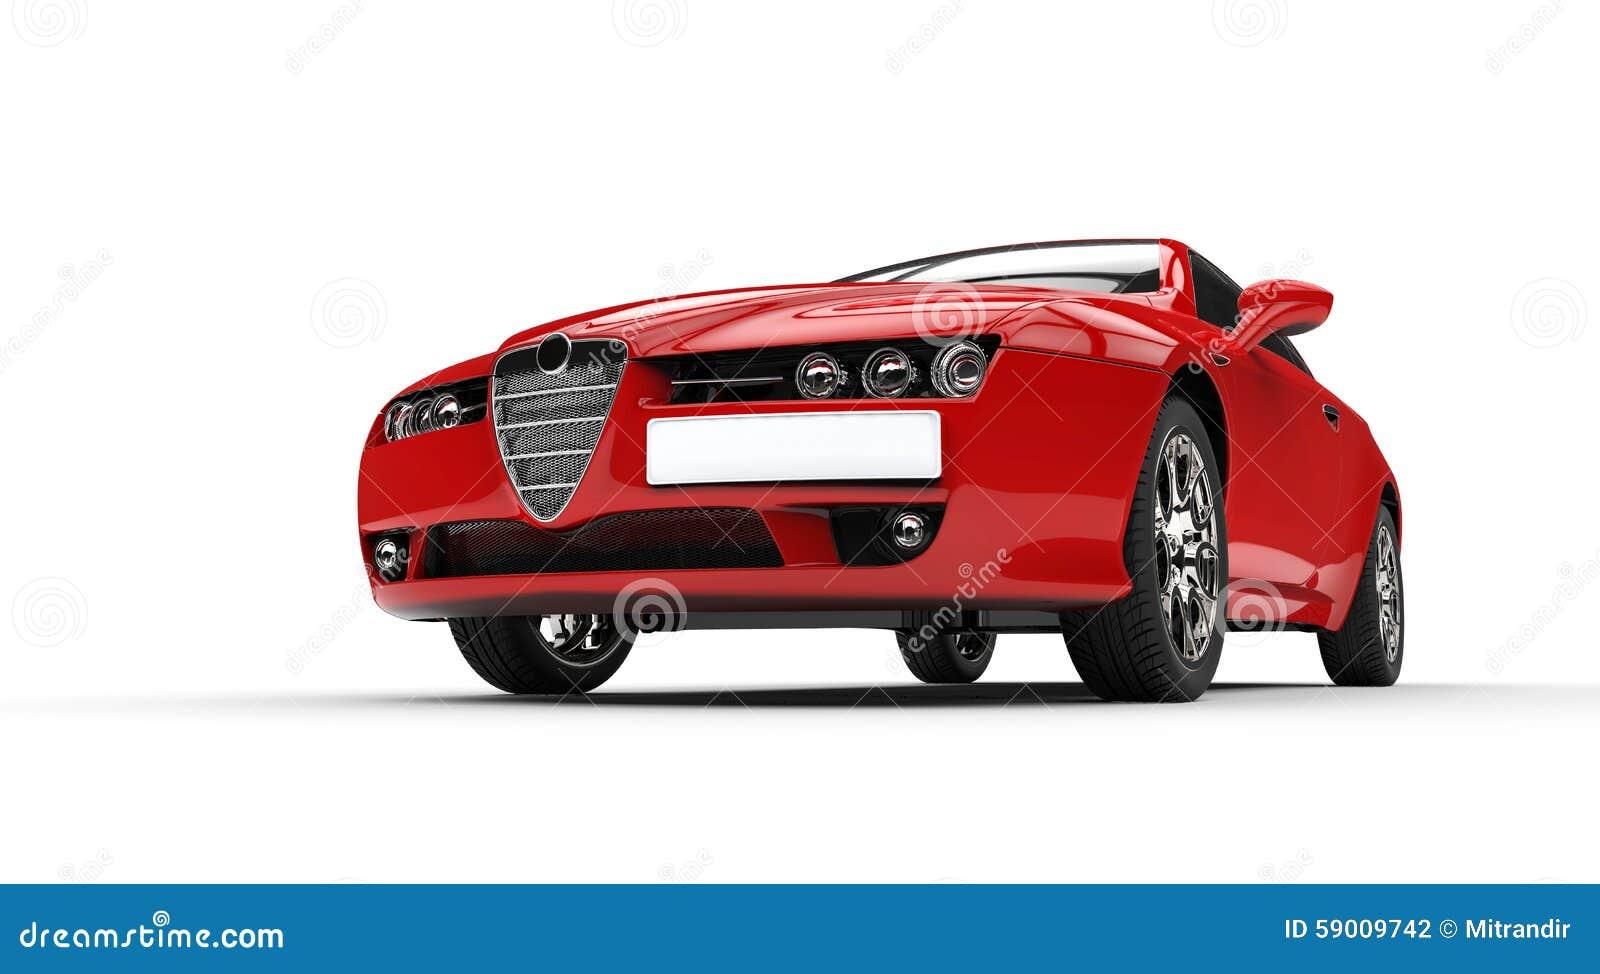 Italian Red Car Stock Photo - Image: 59009742